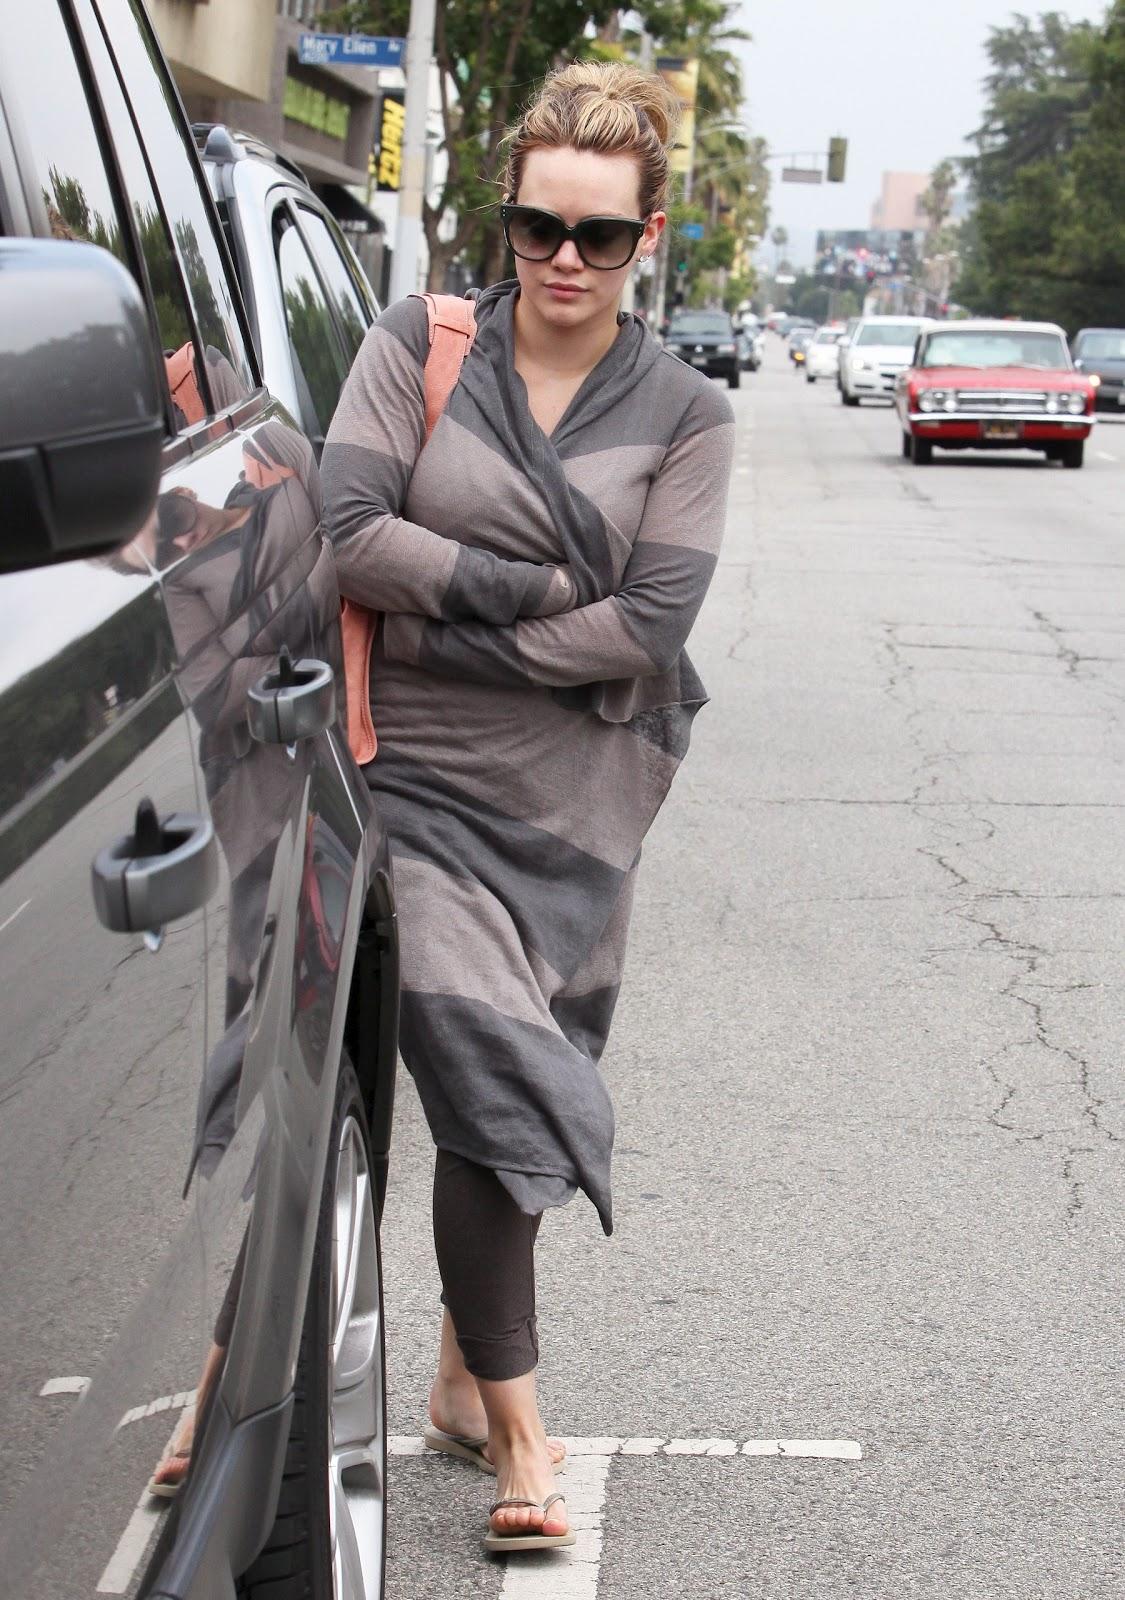 http://4.bp.blogspot.com/-I1Sya8UPJz0/TfLO41wChmI/AAAAAAAAFNY/Jz8v9tWn74U/s1600/35674_Preppie_Hilary_Duff_leaving_a_nail_salon_in_Studio_City_2_122_523lo.JPG